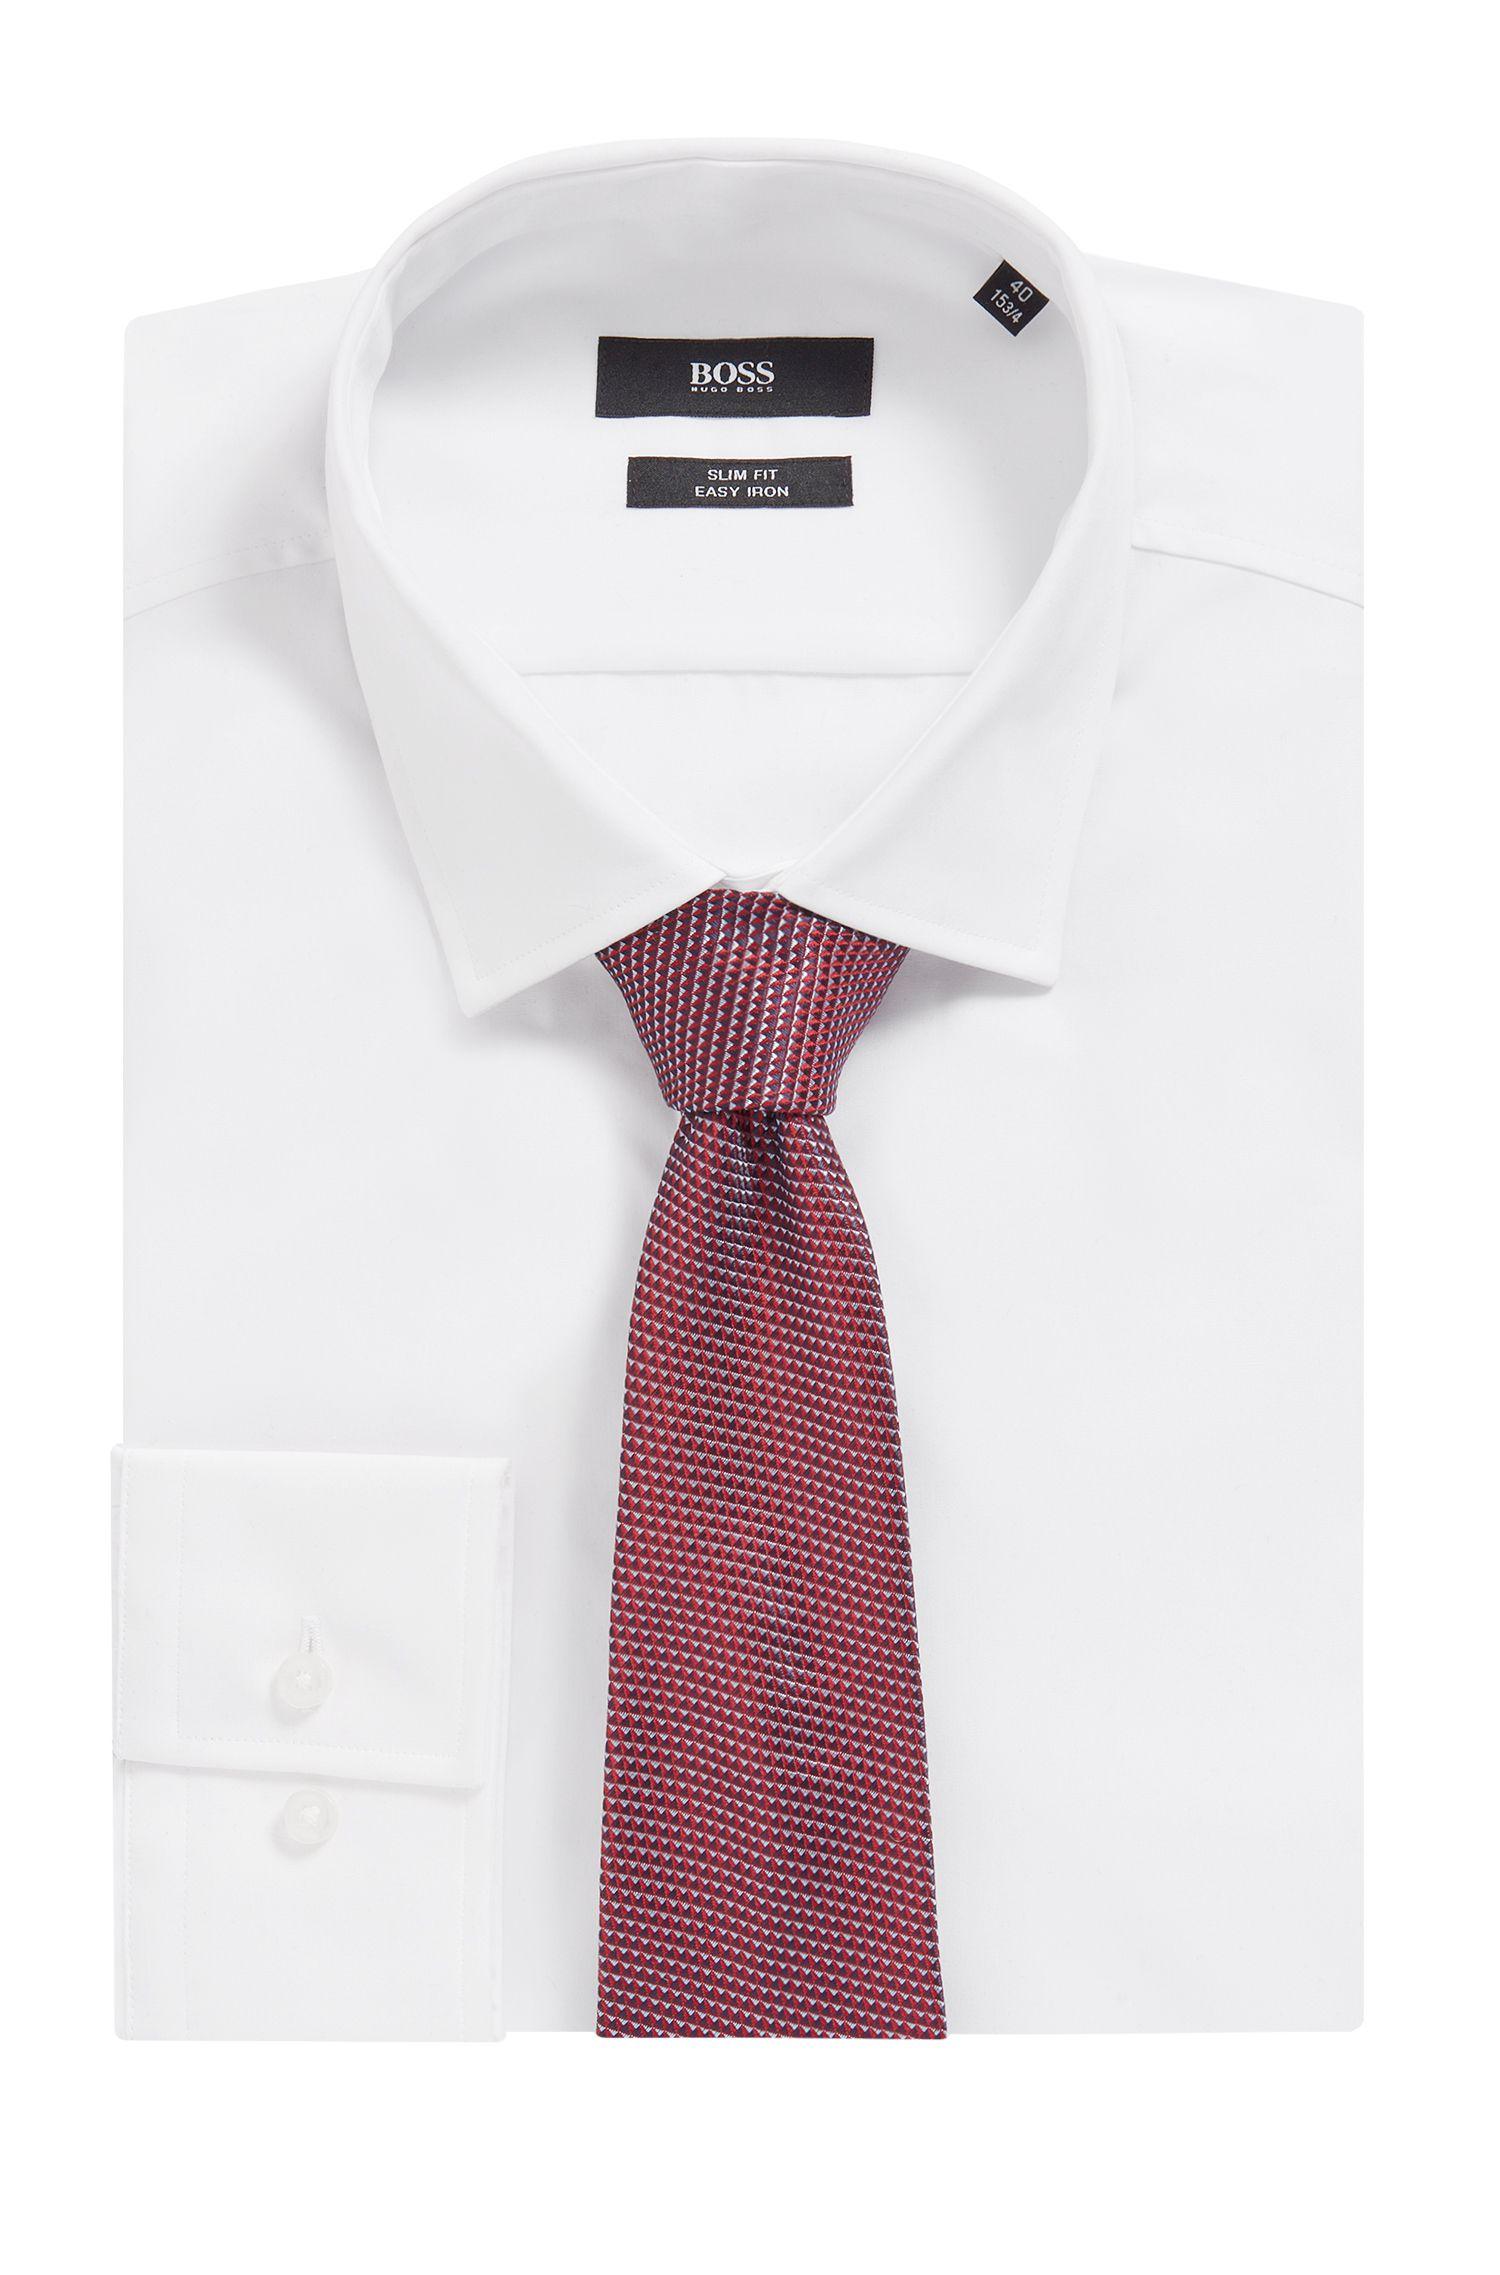 Corbata de jacquard con microestampado fabricada en Italia, Rojo